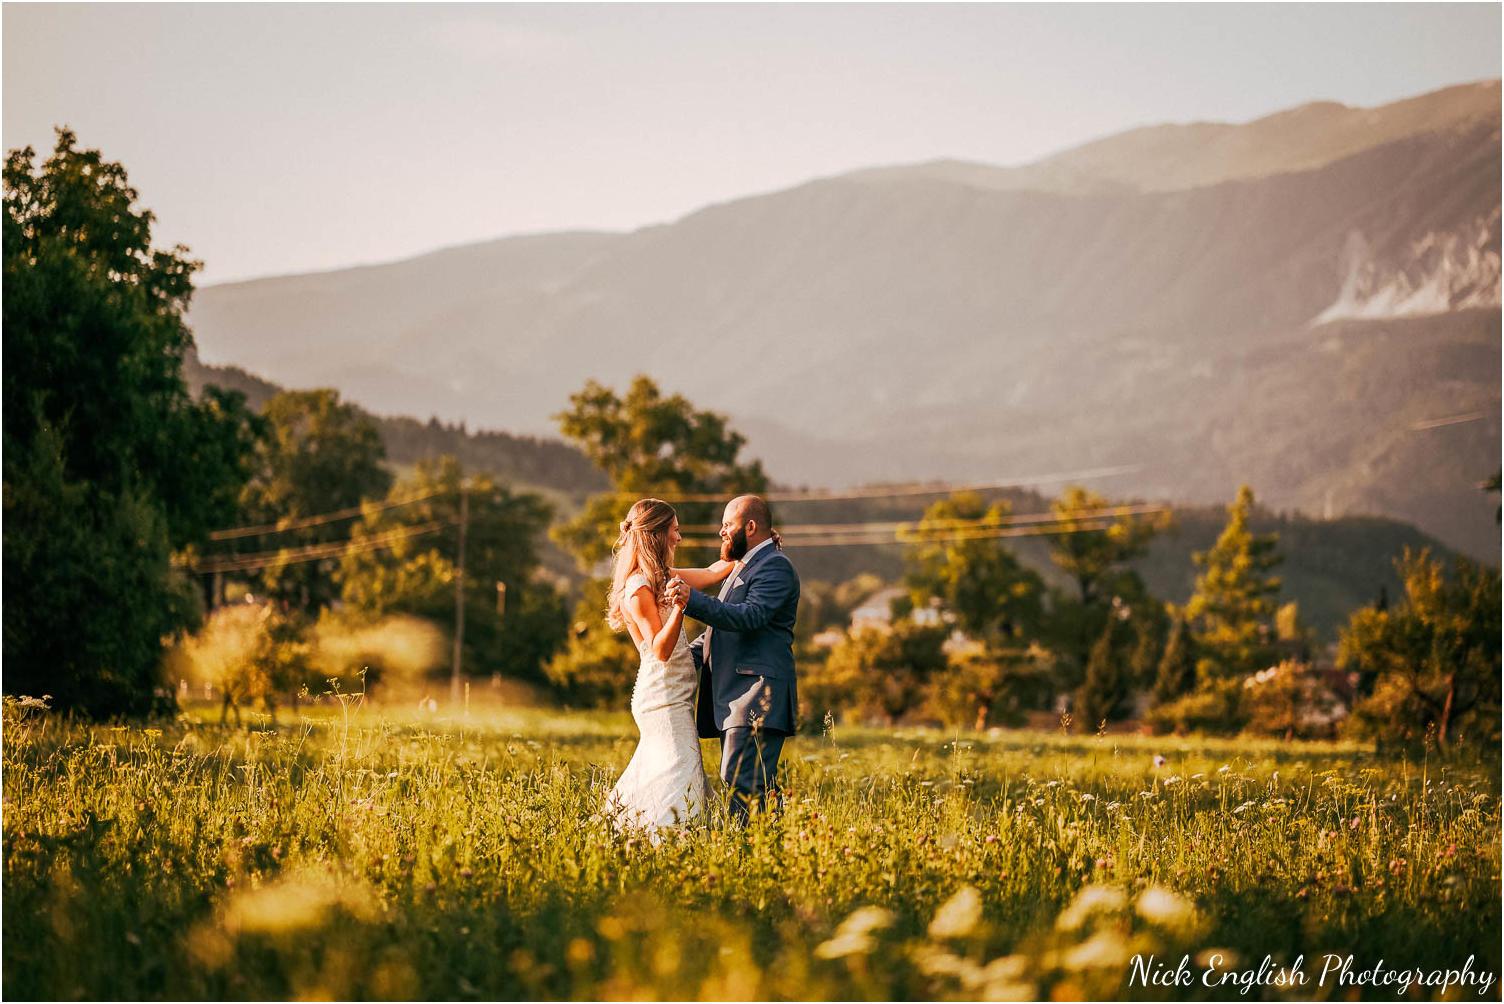 Lake_Bled_Destination_Wedding_Photographs-6.jpg